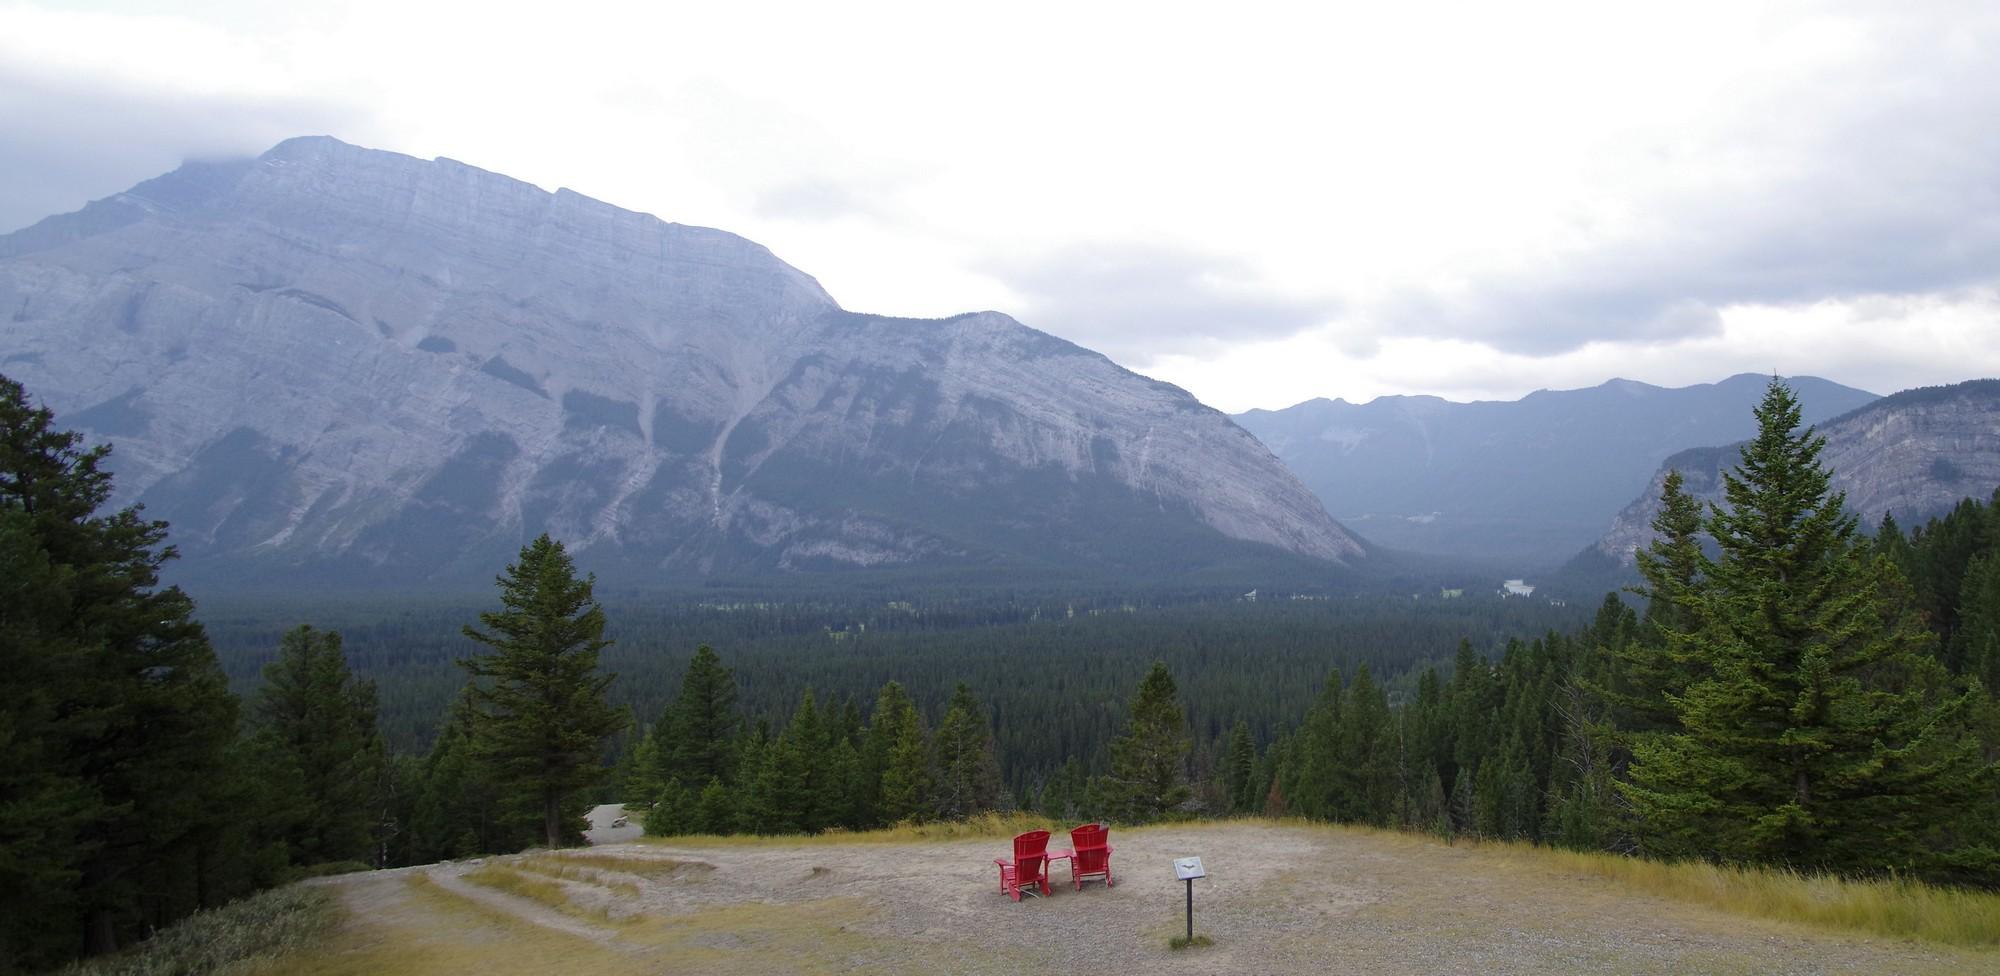 Sulfur Mountain devant la roulotte